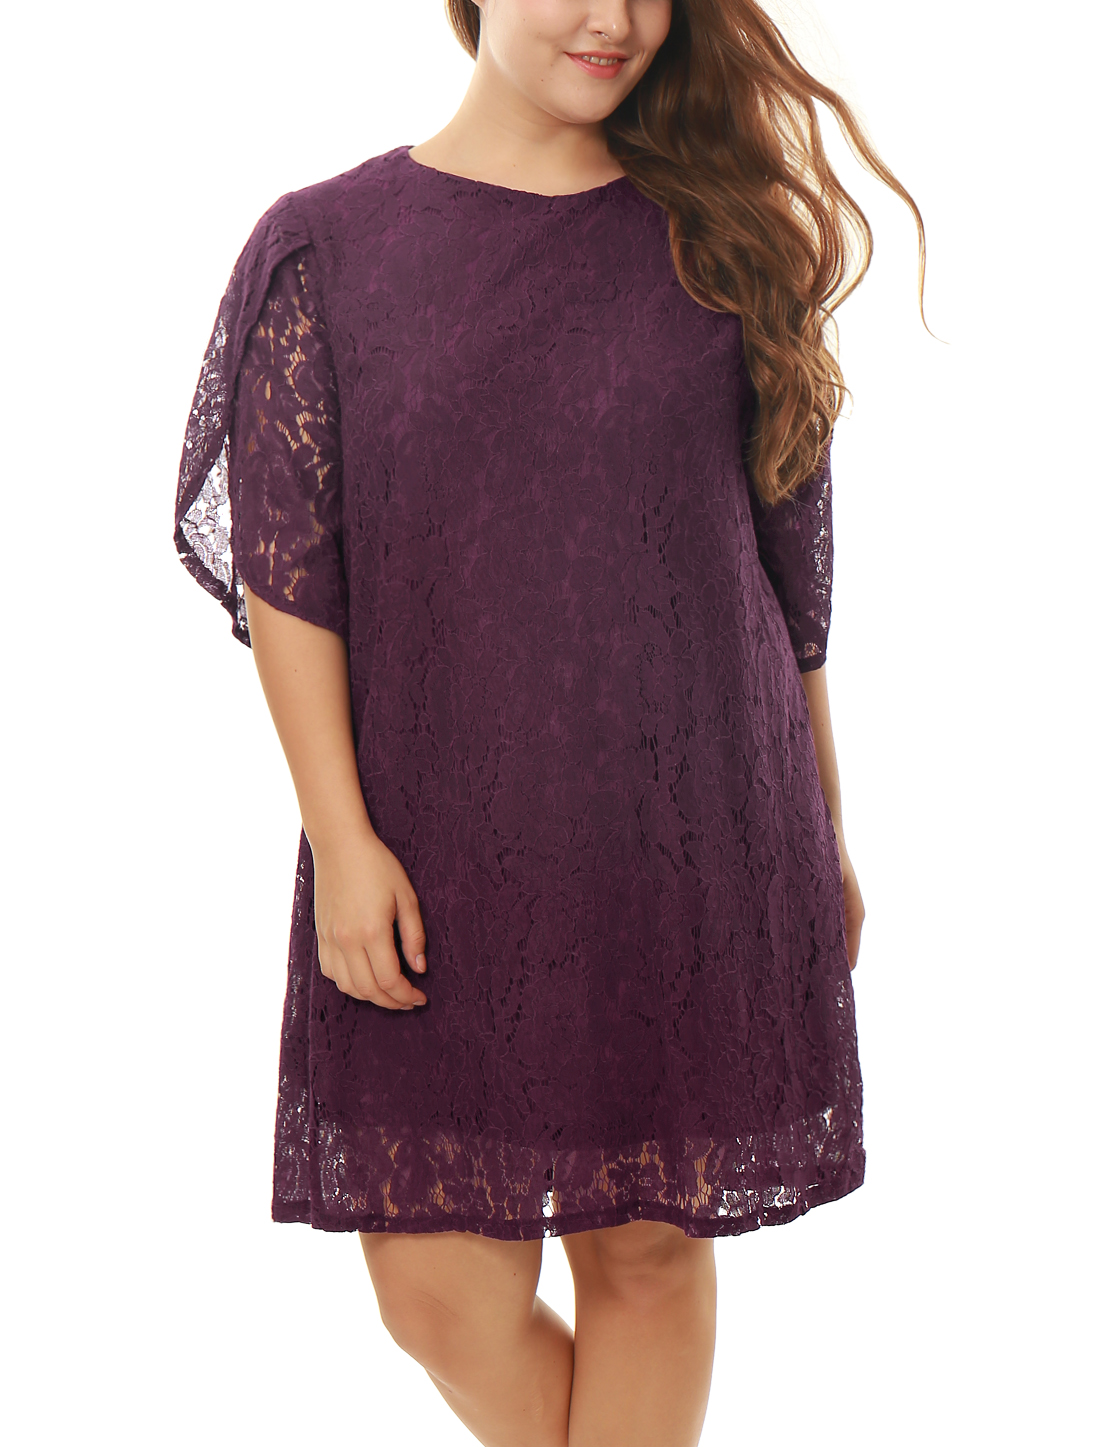 Women Plus Size Tulip Sleeves Floral Lace Shift Dress Burgundy 2X